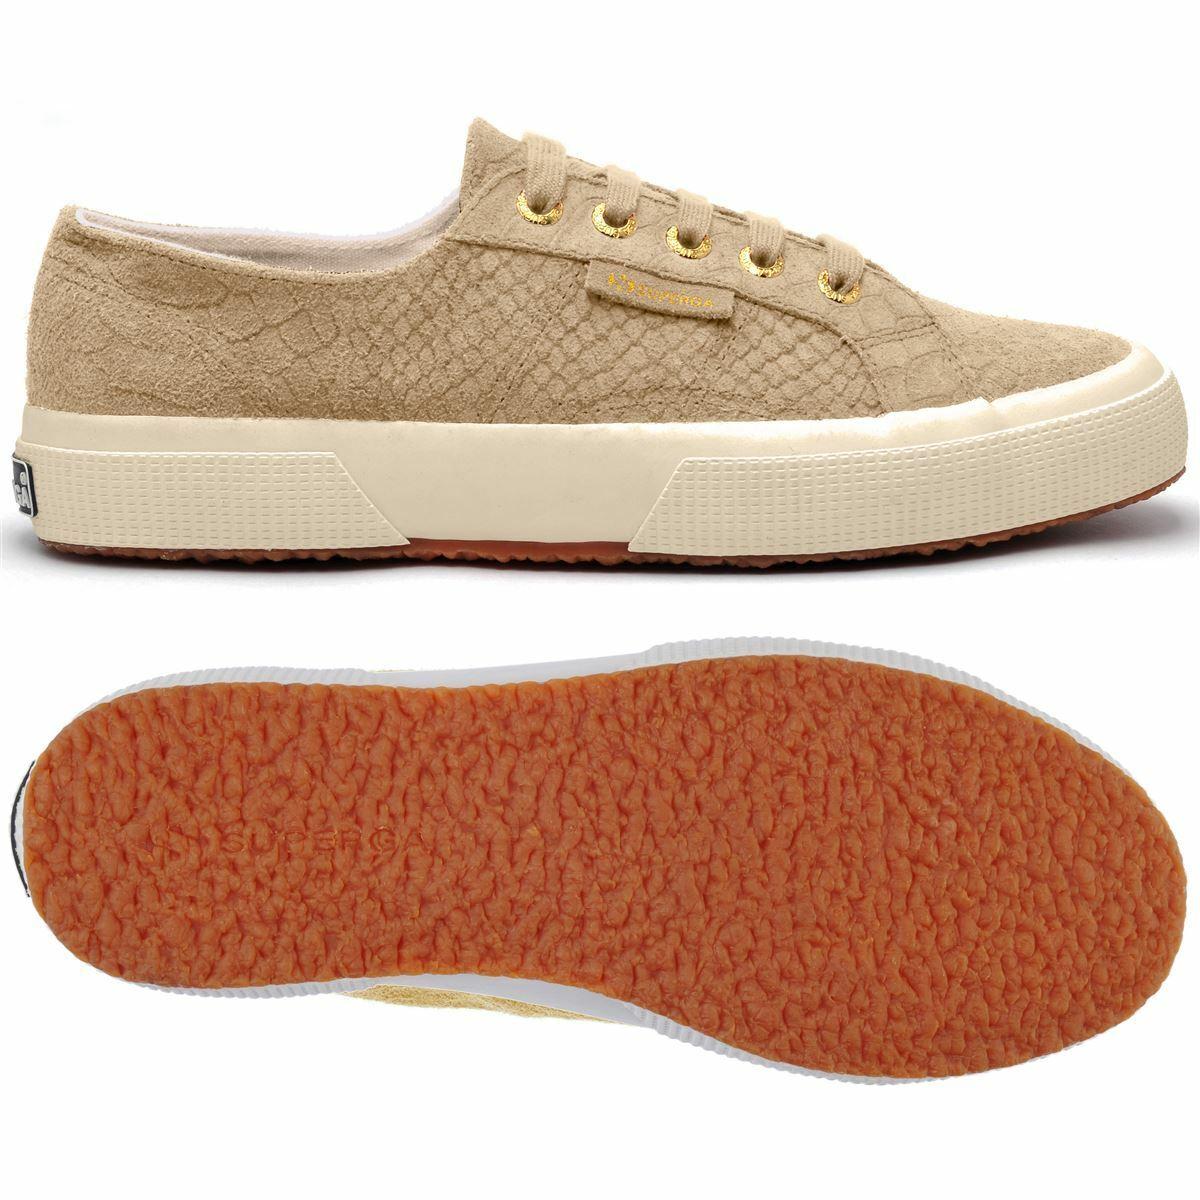 Superga Scarpe ginnastica Donna 2750-SUEANACONDAW Tempo libero scarpe da ginnastica ginnastica ginnastica 0a398c